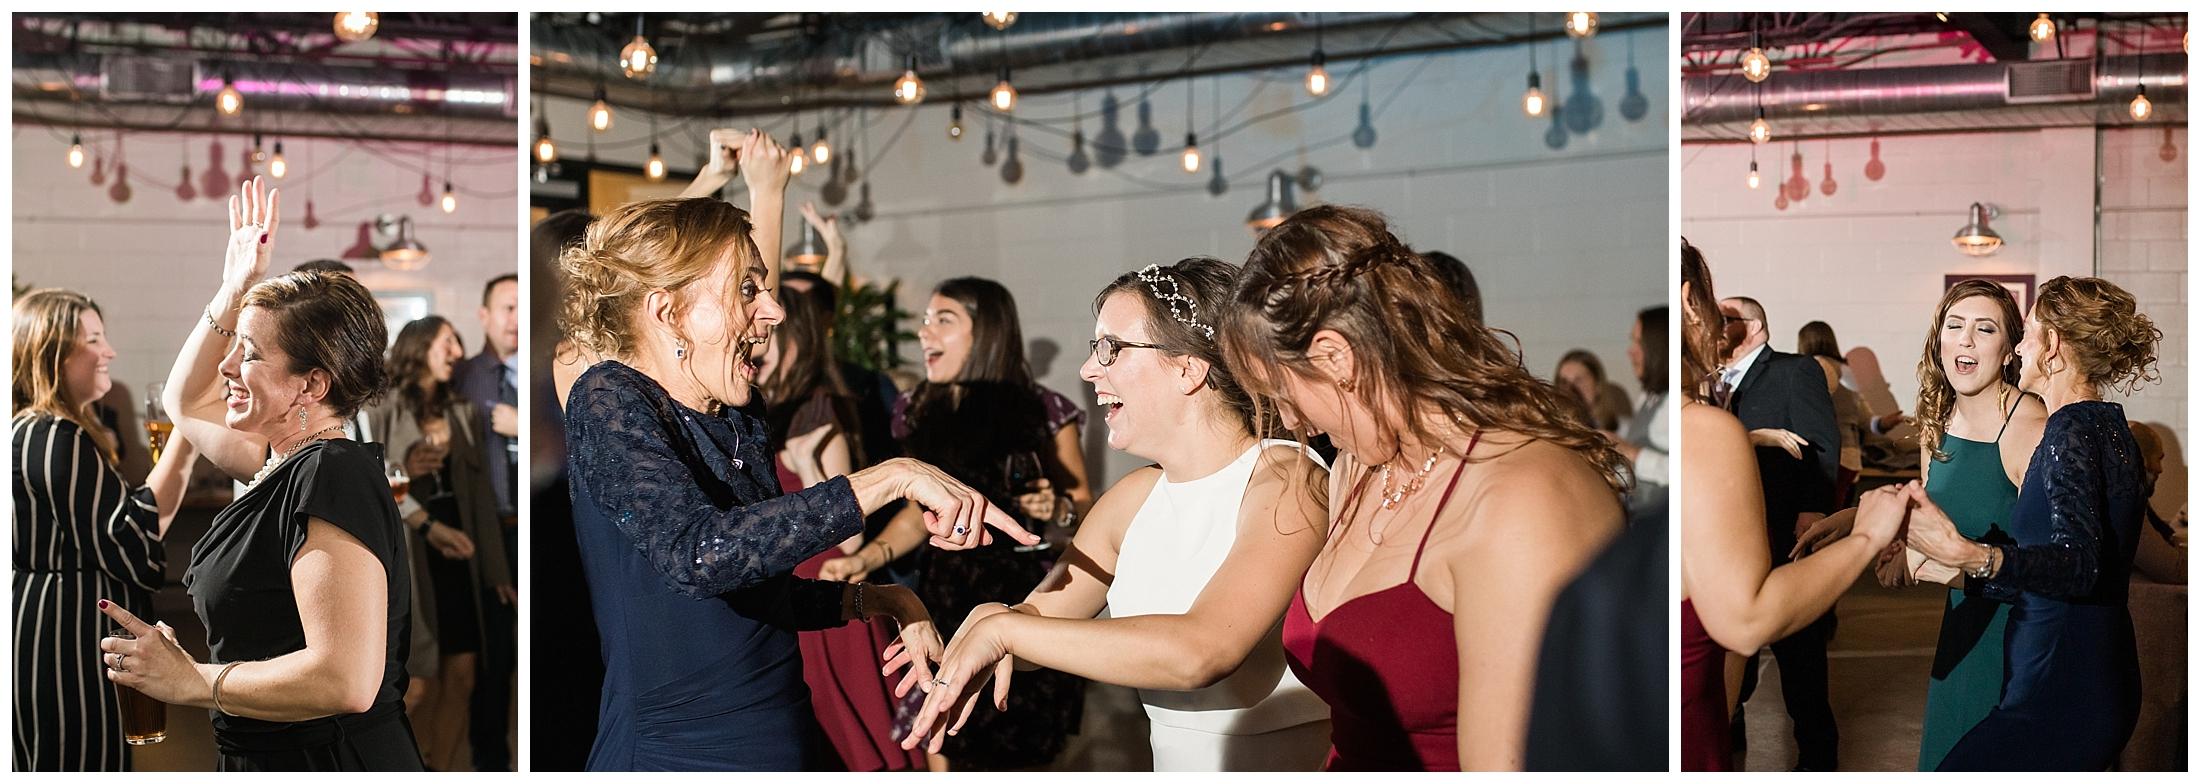 Philadelphia-Wedding-Brewery-Wedding-58.jpg